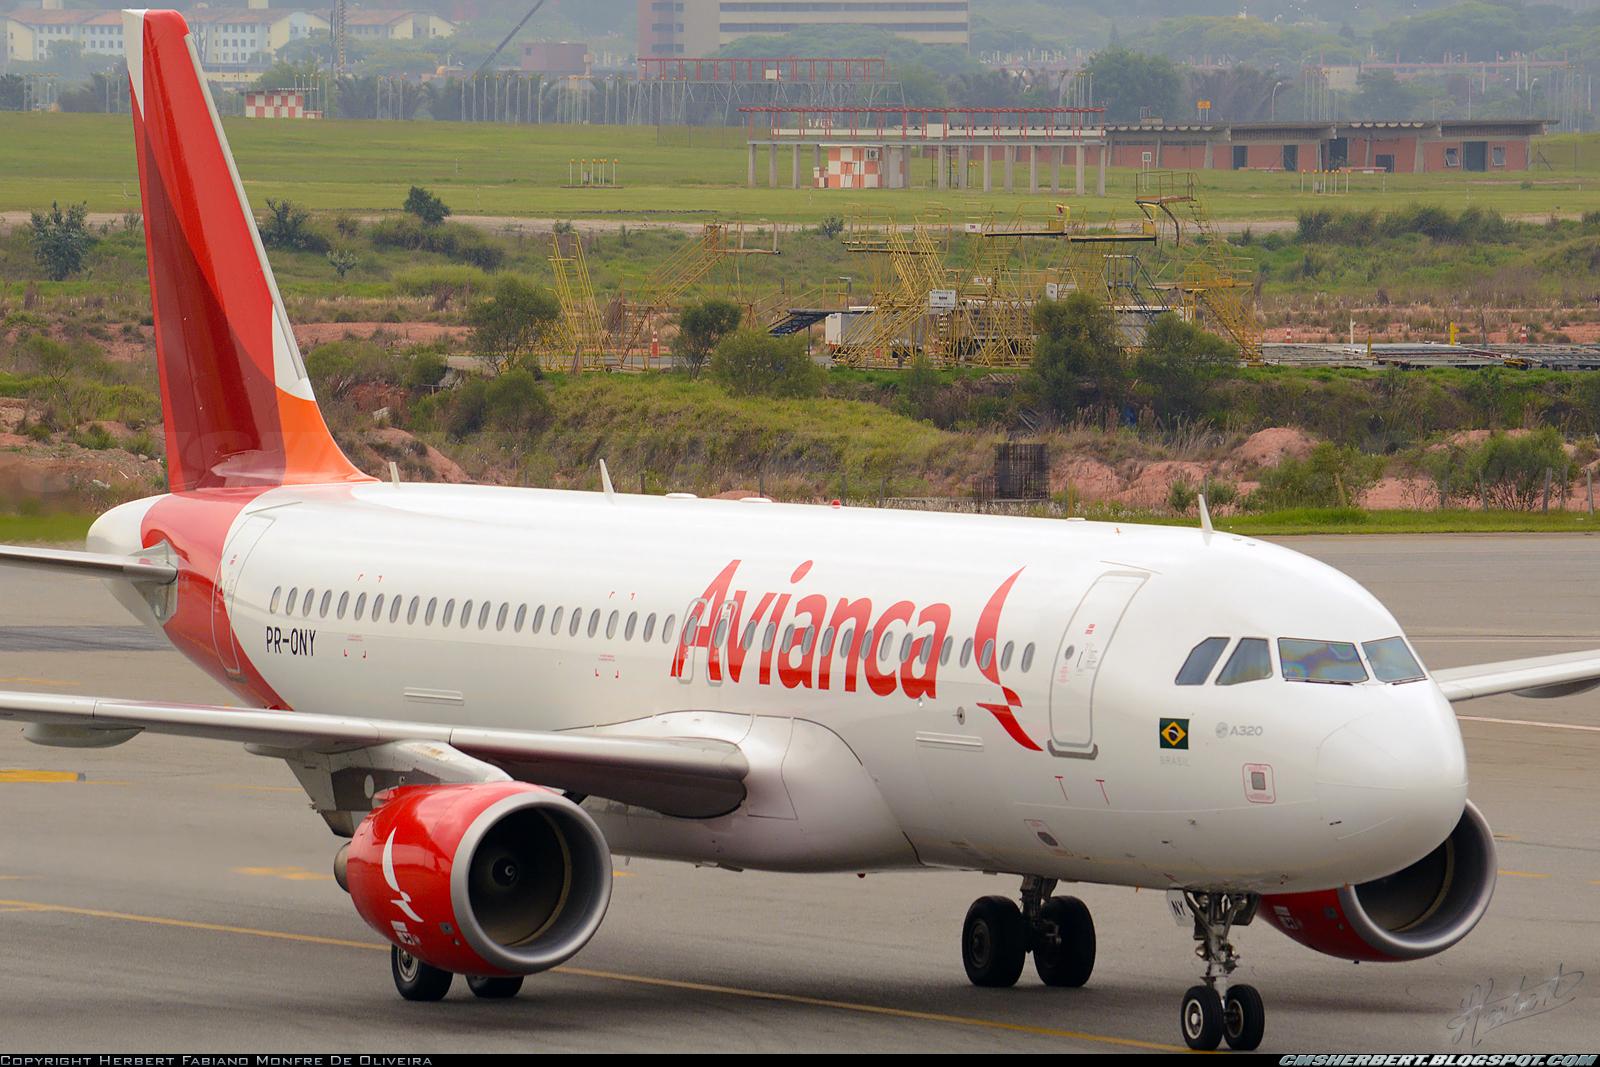 Julho 2016 – Avianca Brasil encomenda 62 aeronaves A320neo